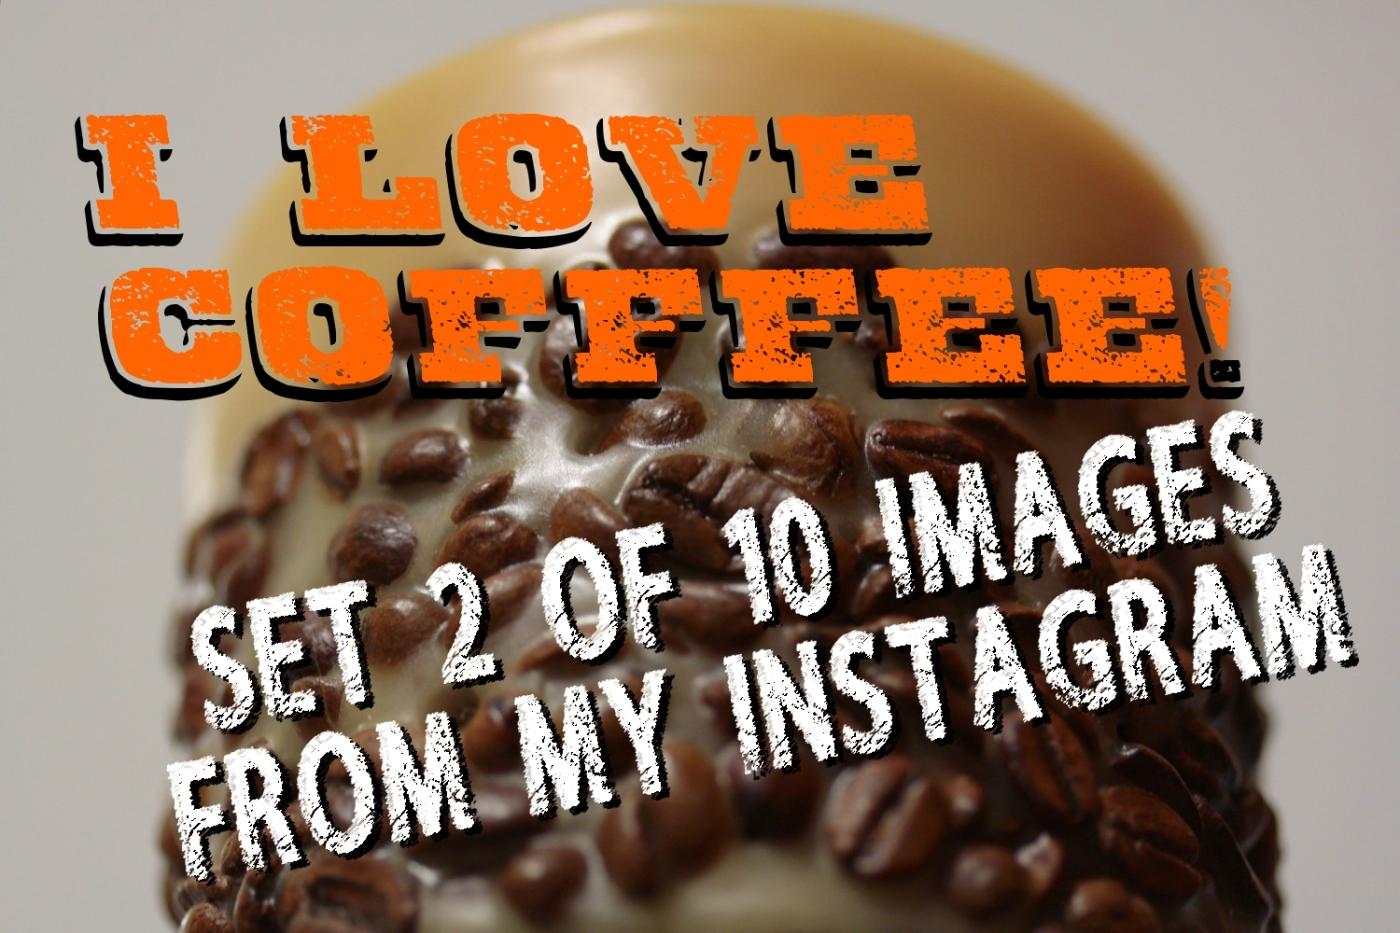 Set 2 of 10 Instagram Coffee Posts